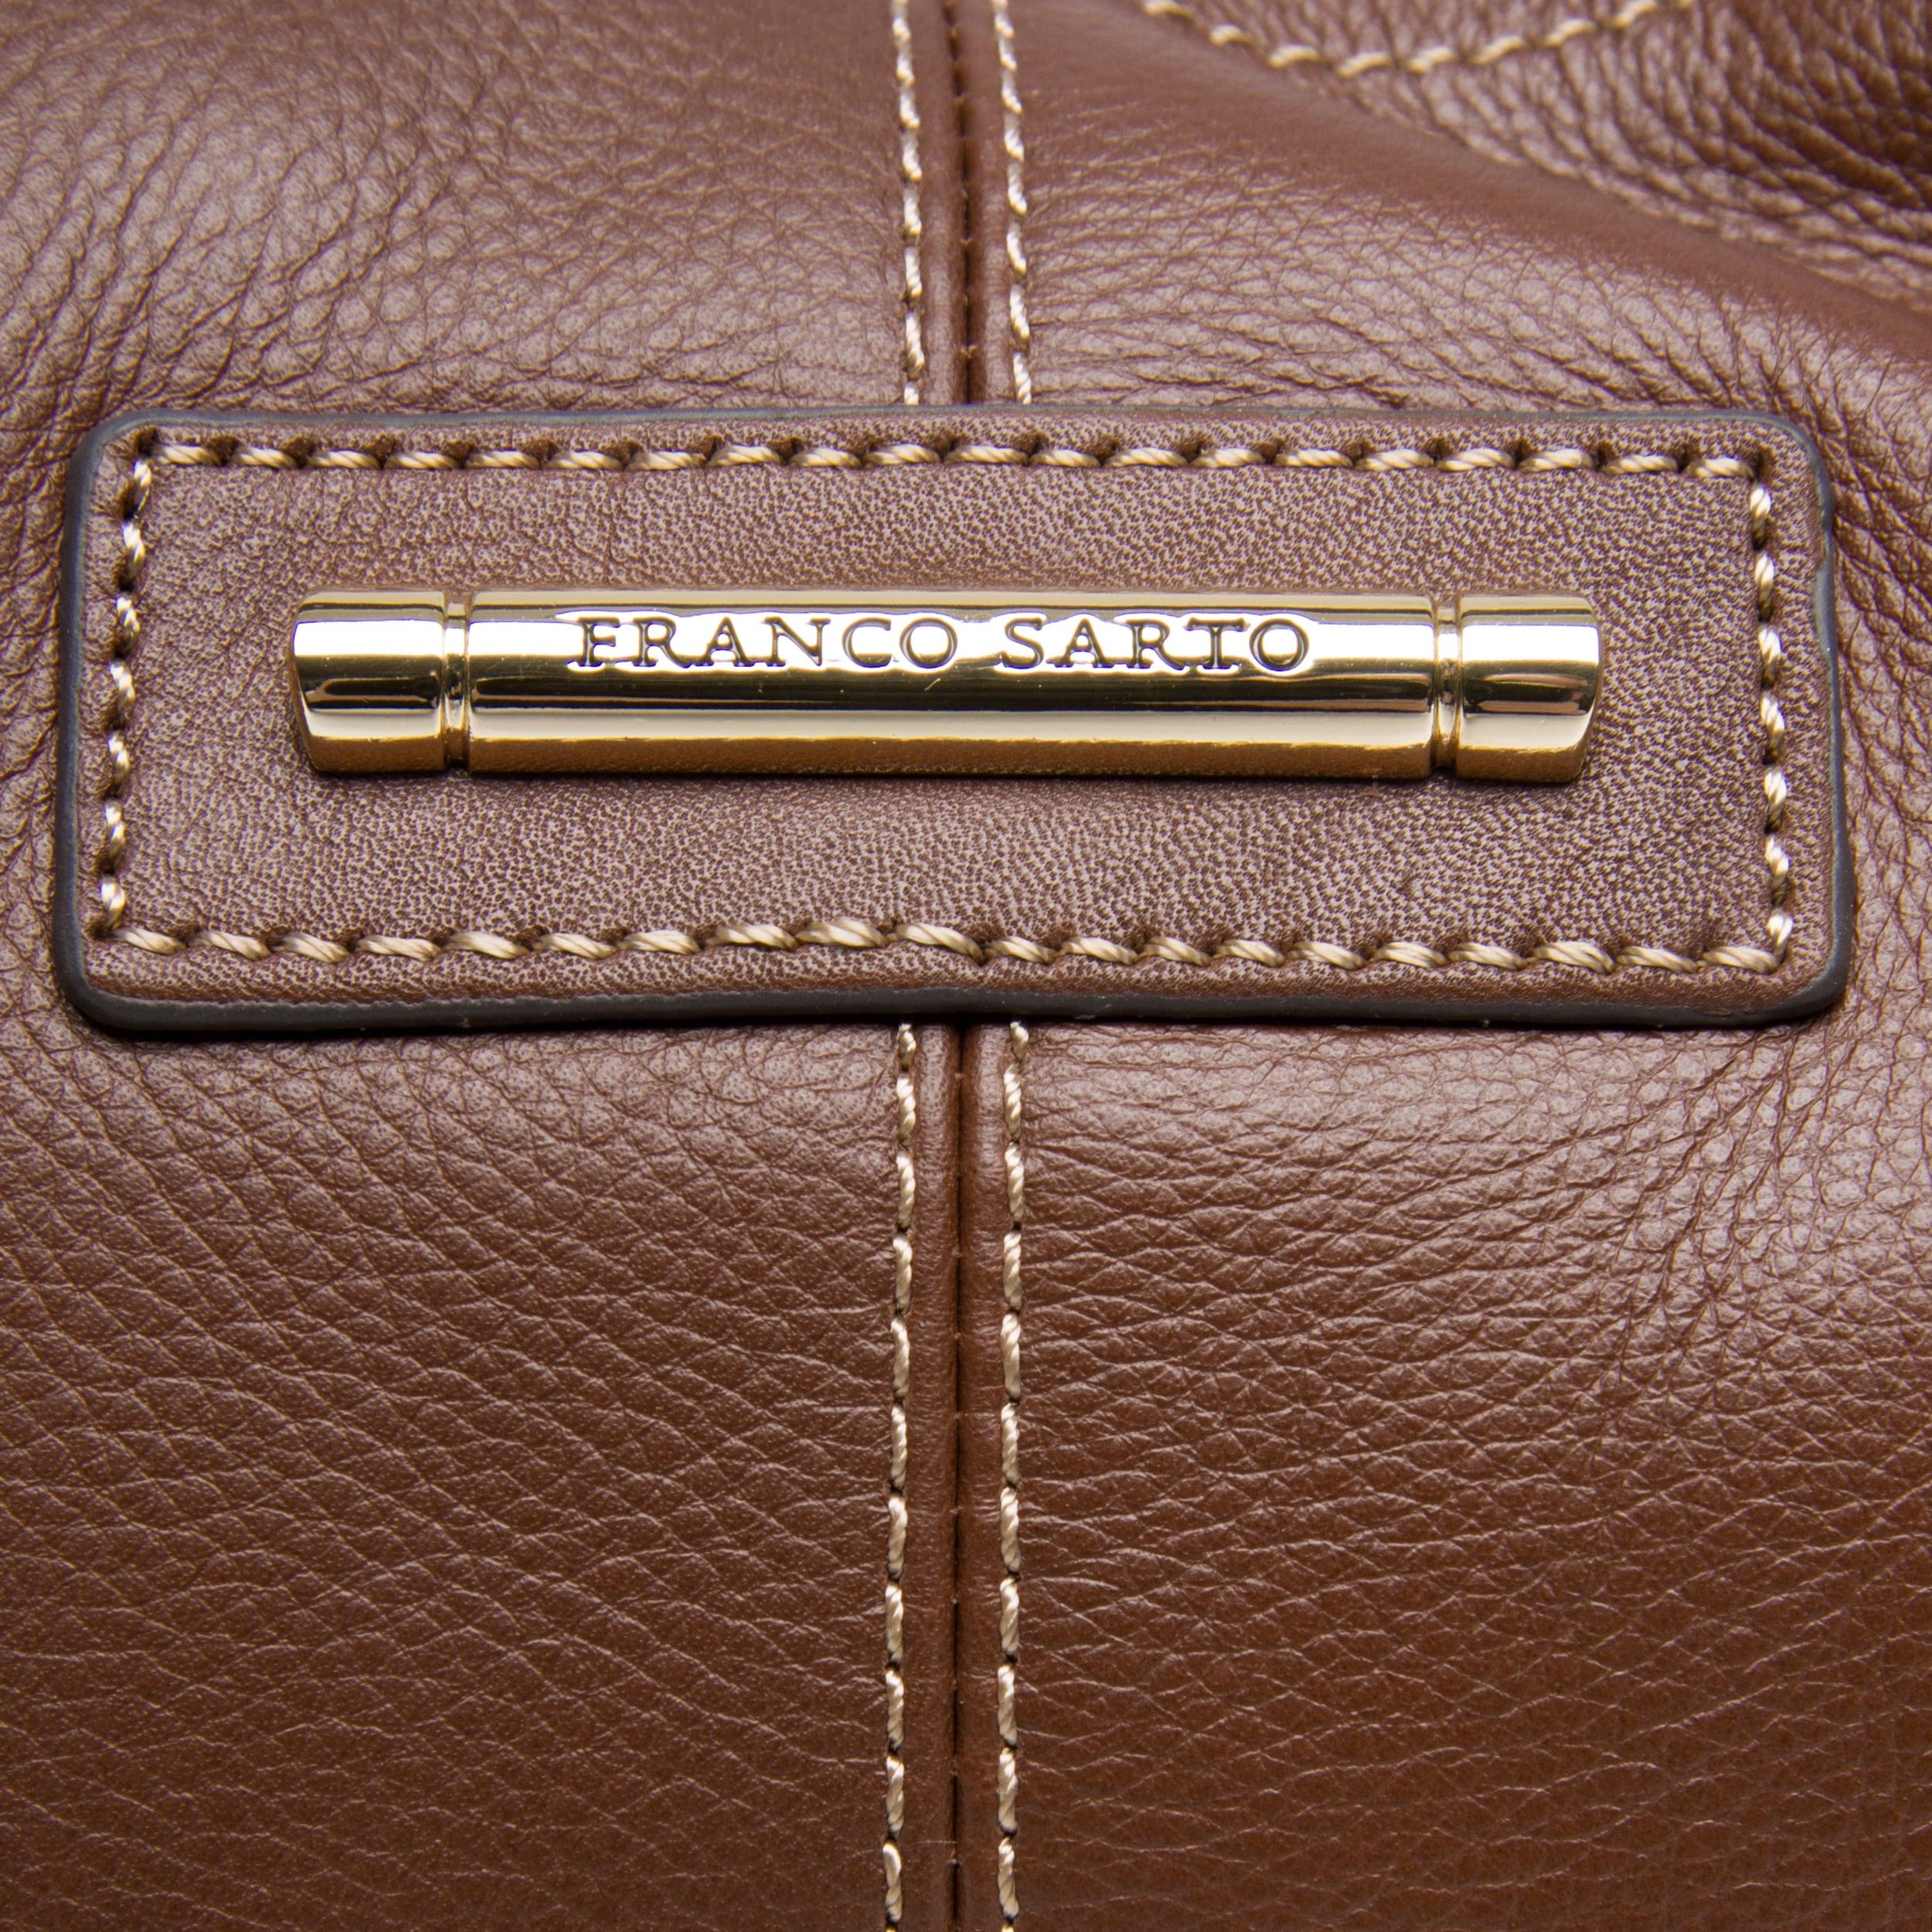 fe69b745dade Shop Franco Sarto Jolie Hobo Handbag - Free Shipping Today - Overstock -  7724150